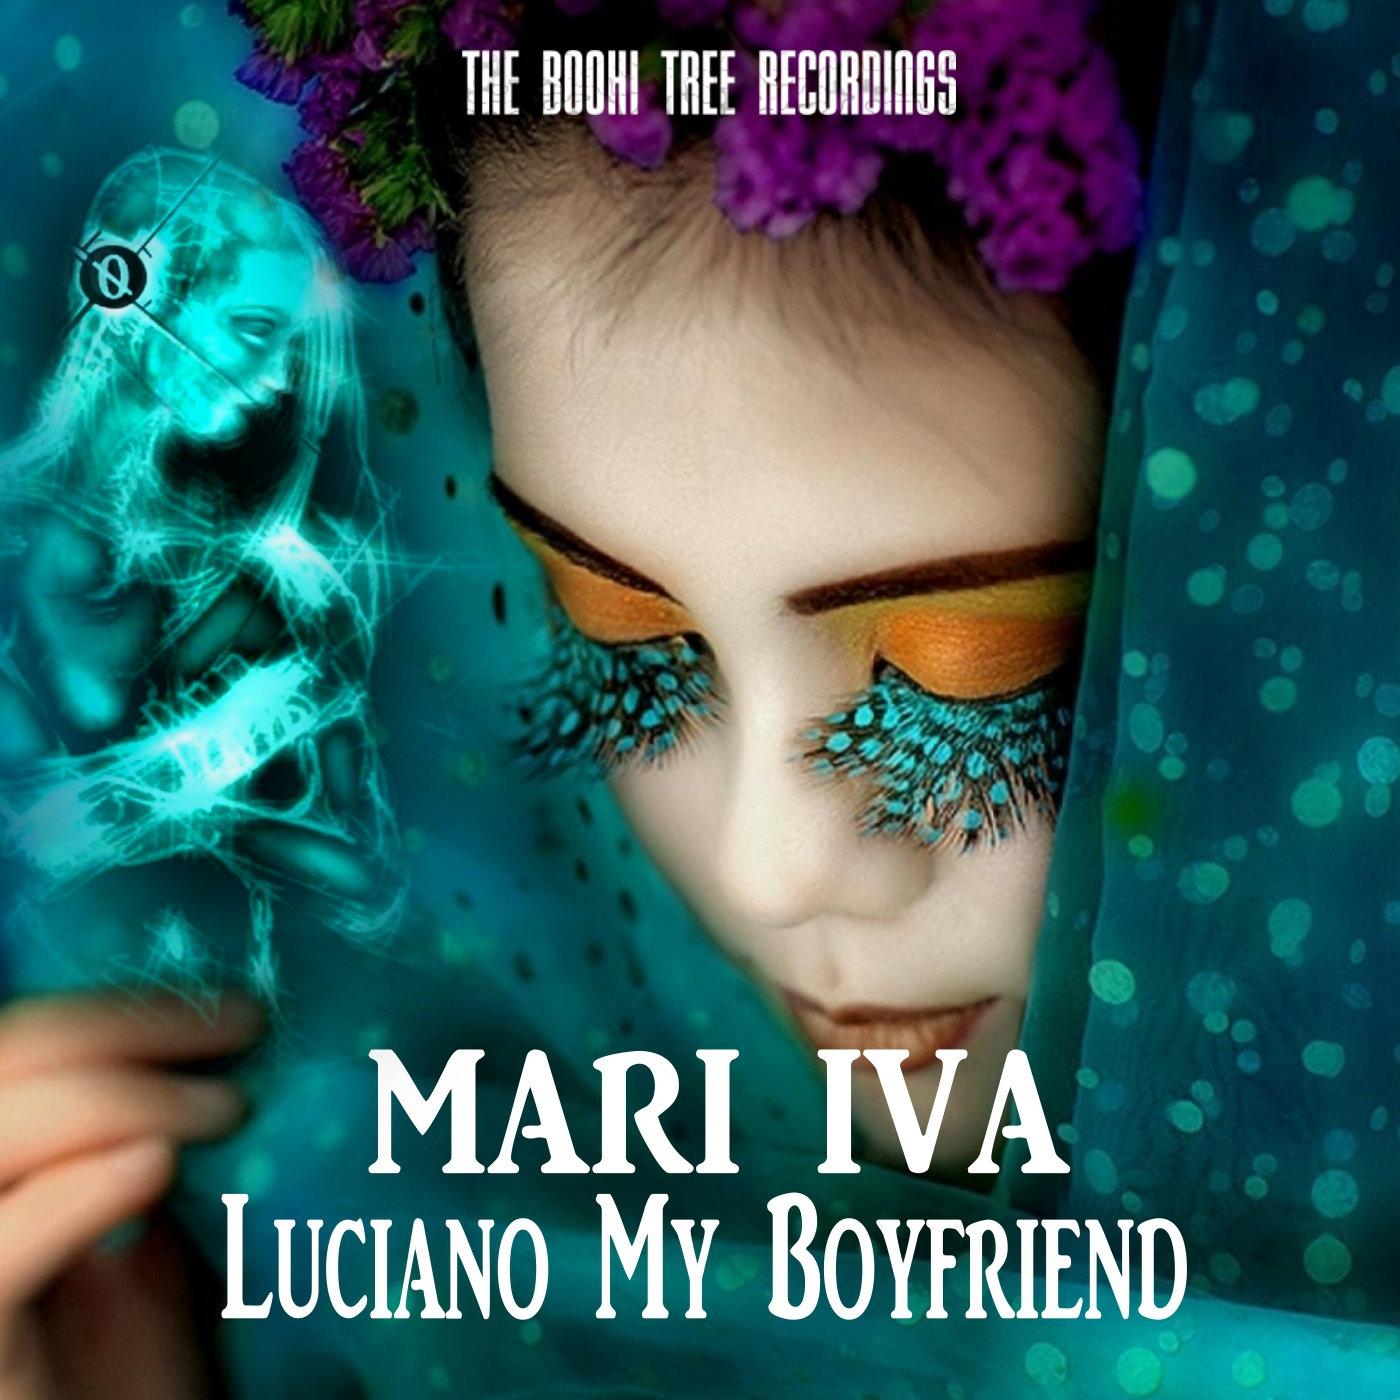 MARI IVA - Luciano My Boyfriend (Original Mix)